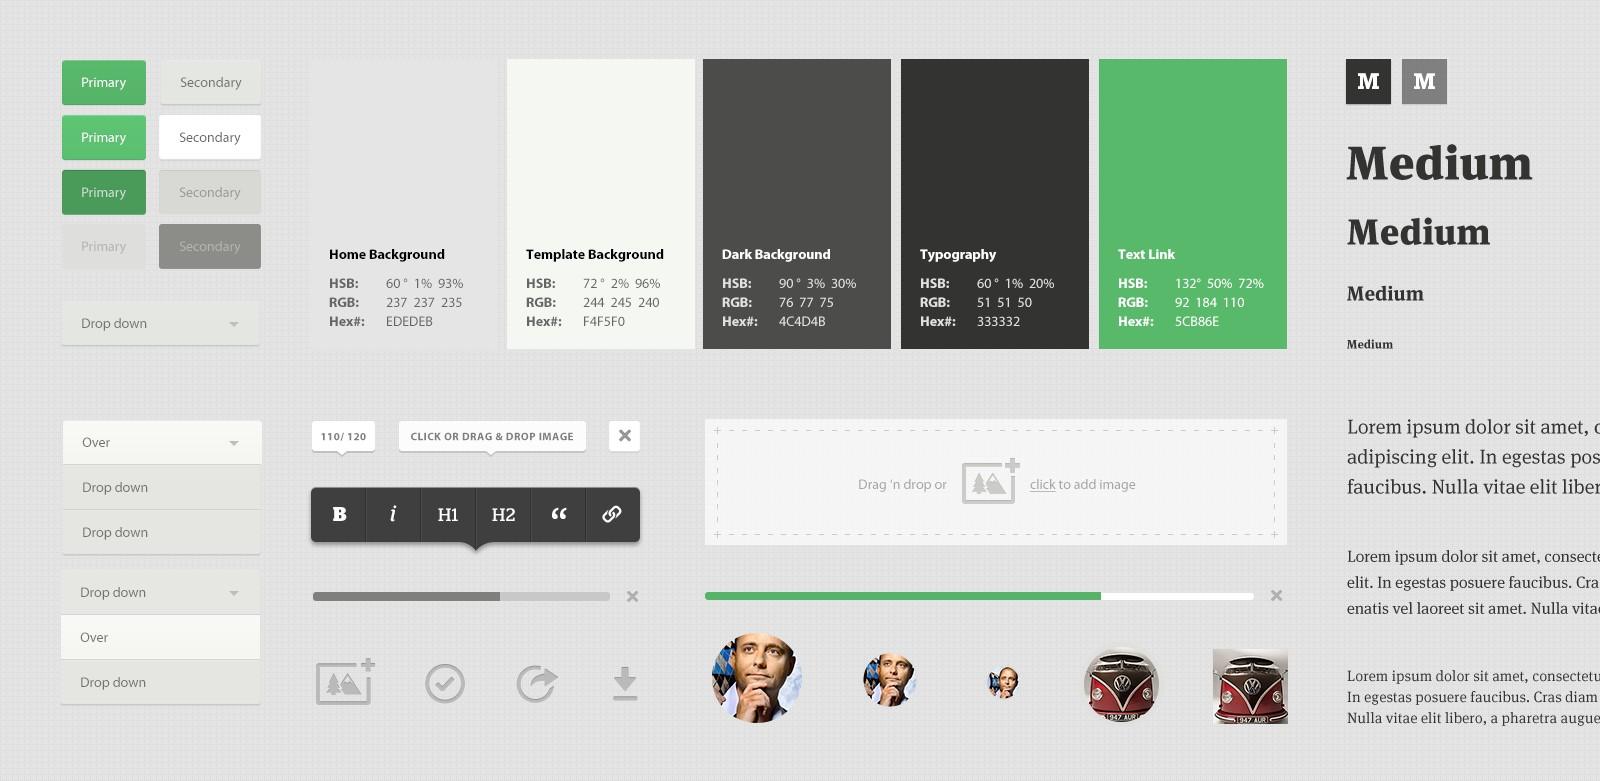 Medium.com Ui Style Guide by Teehan+Lax